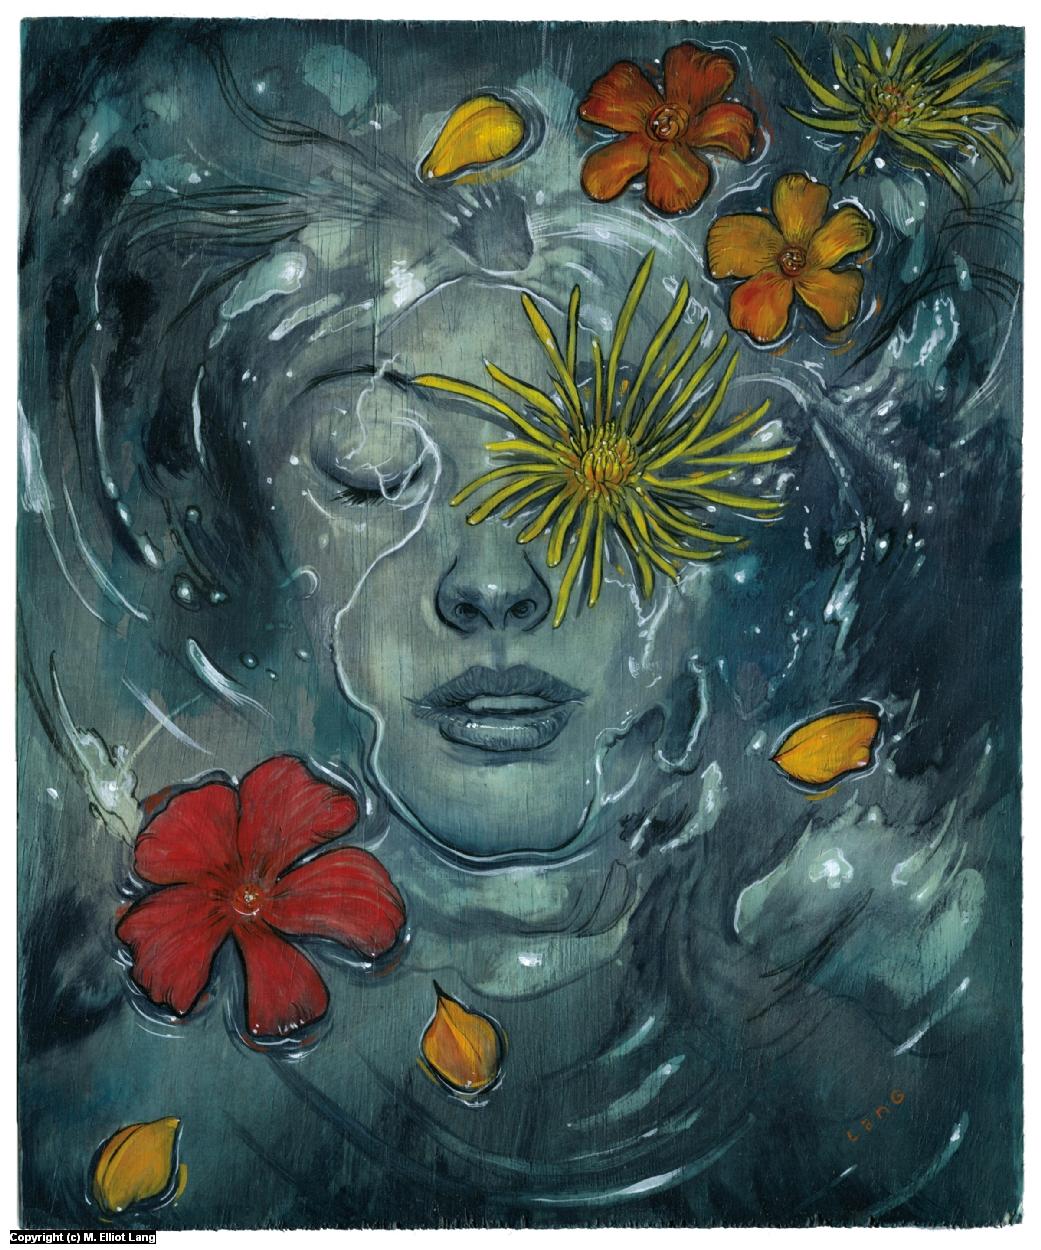 Breath Artwork by Elliot Lang